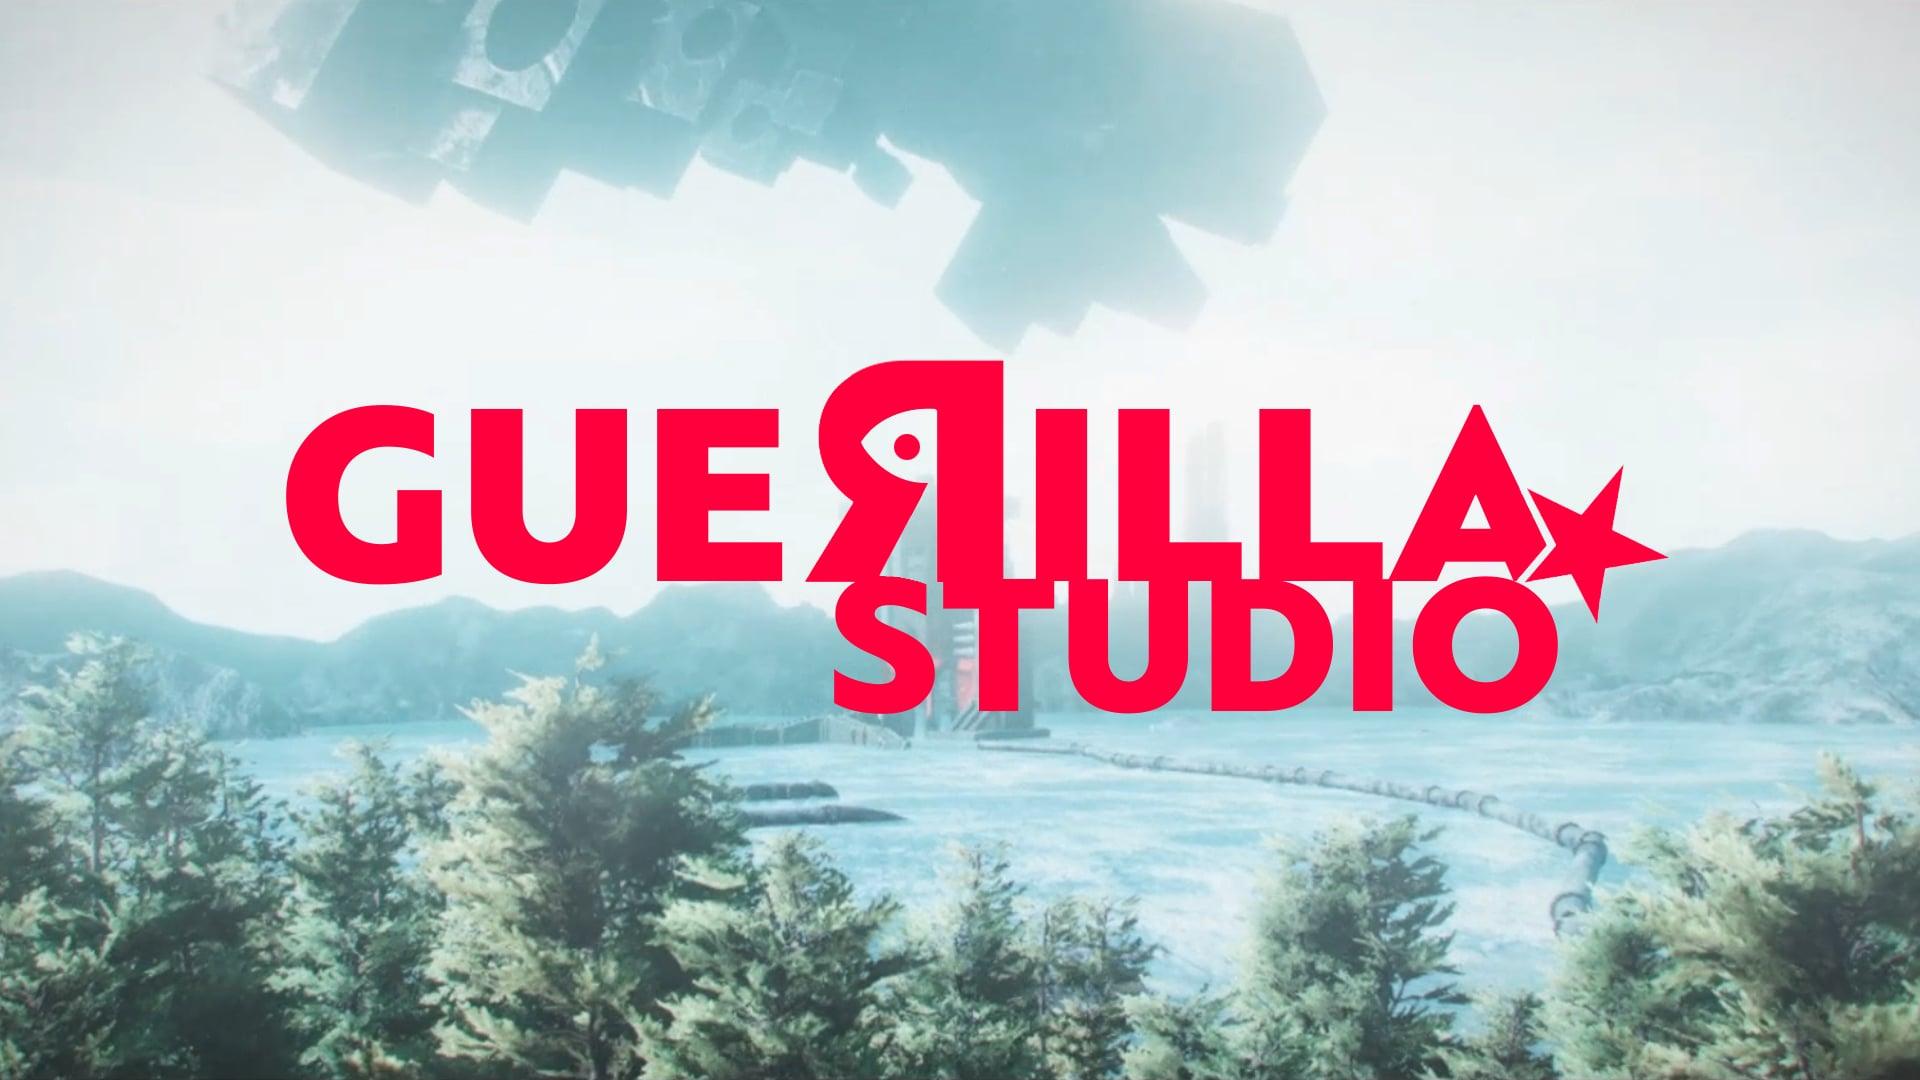 Guerilla Motion Studio - Showreel 2020